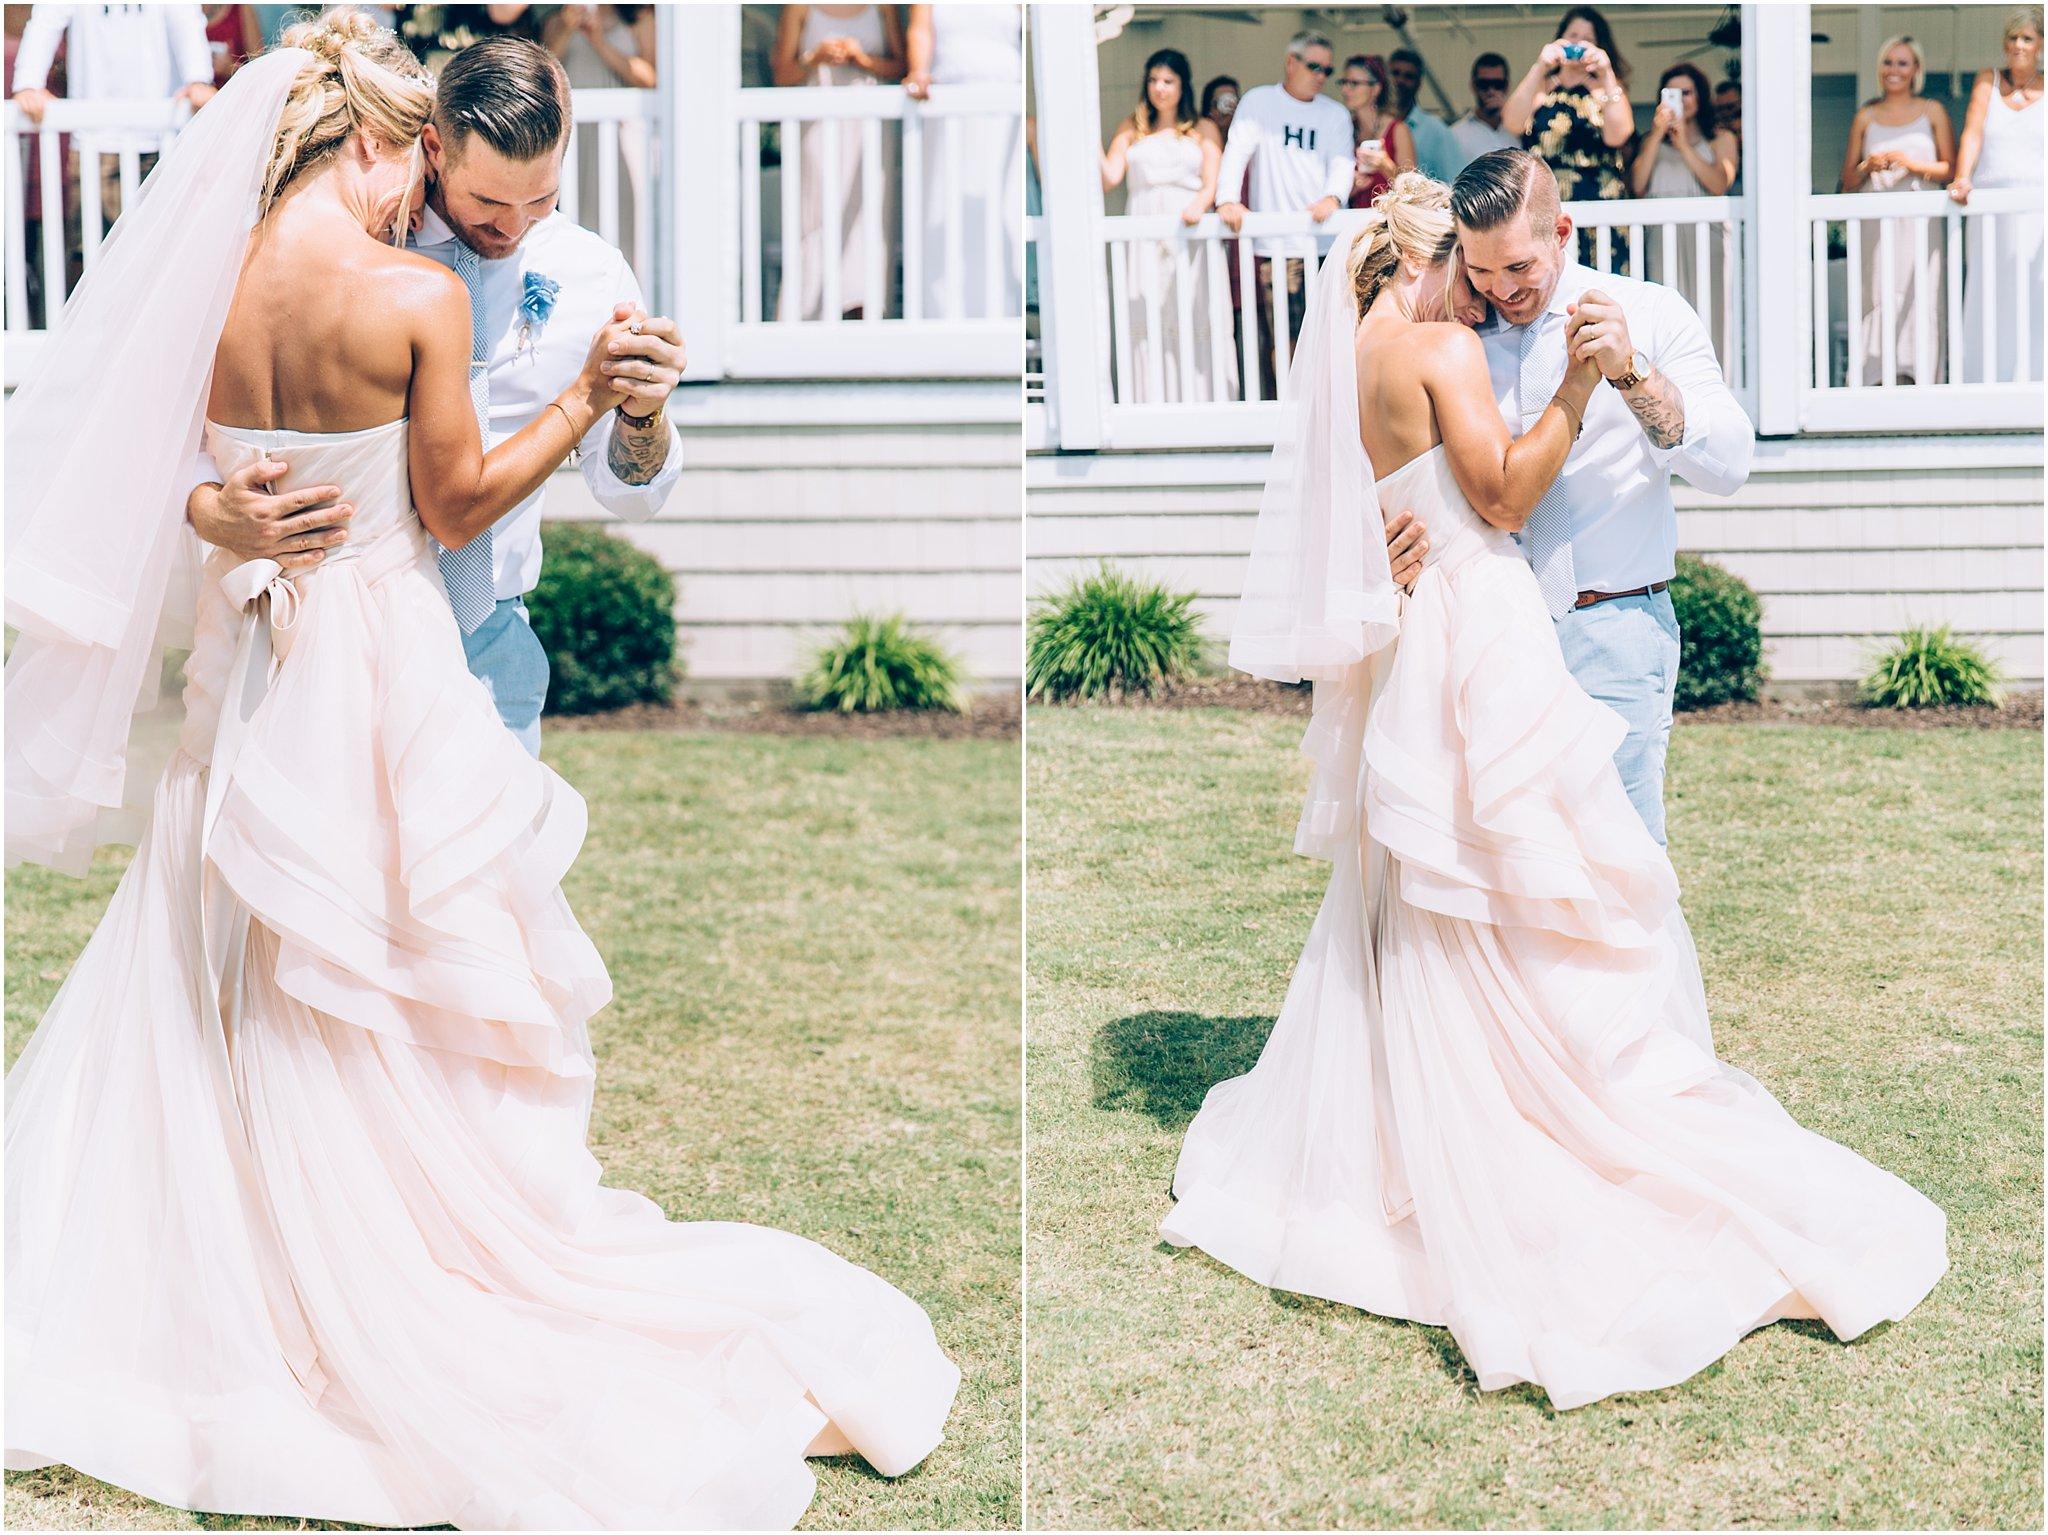 jessica_ryan_photography_wedding_hampton_roads_virginia_virginia_beach_weddings_0630